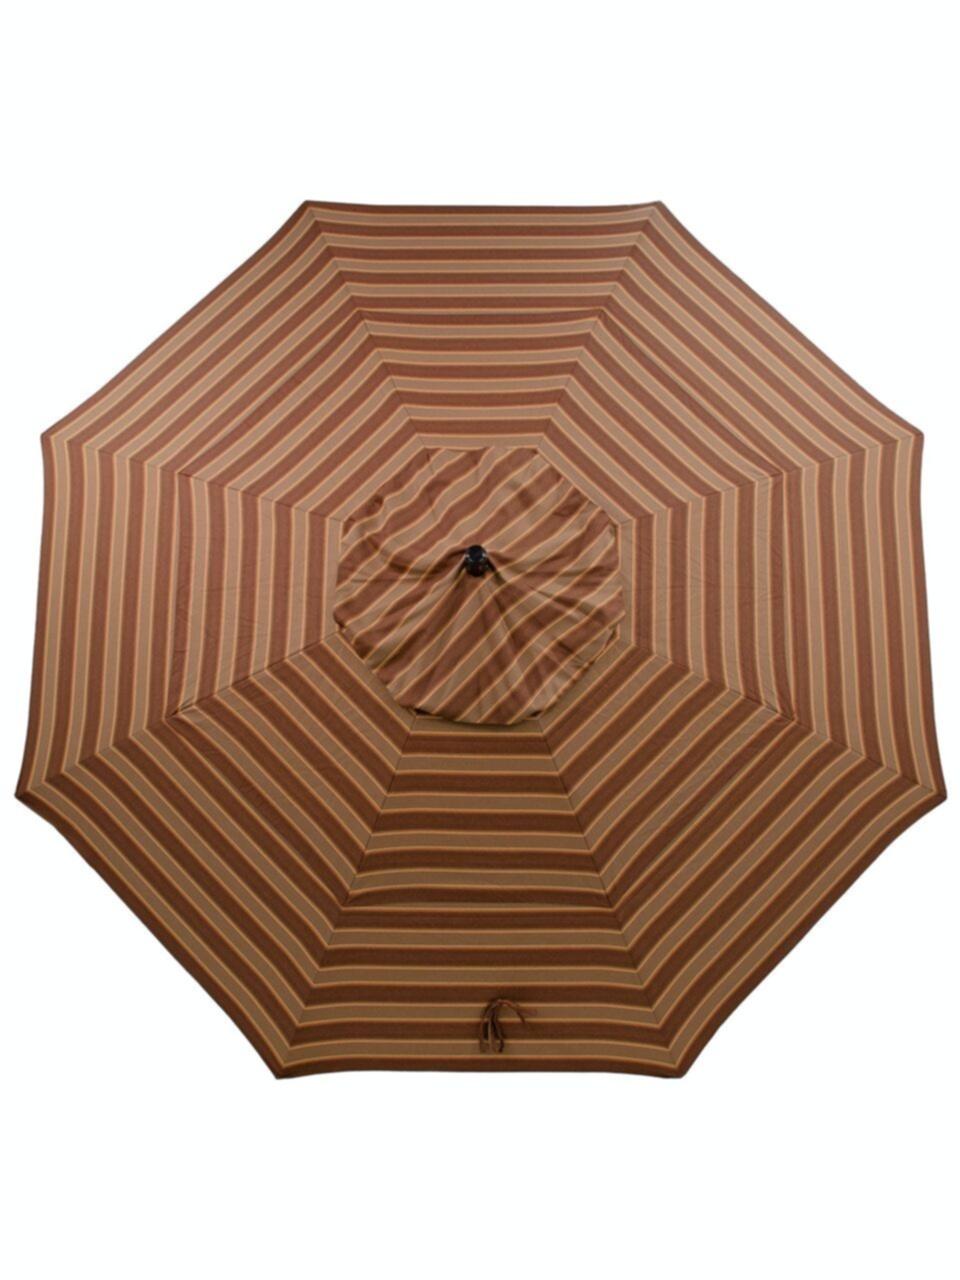 outdoor patio california umbrella 11 ft davidson redwood aluminum market umbrella 3692896